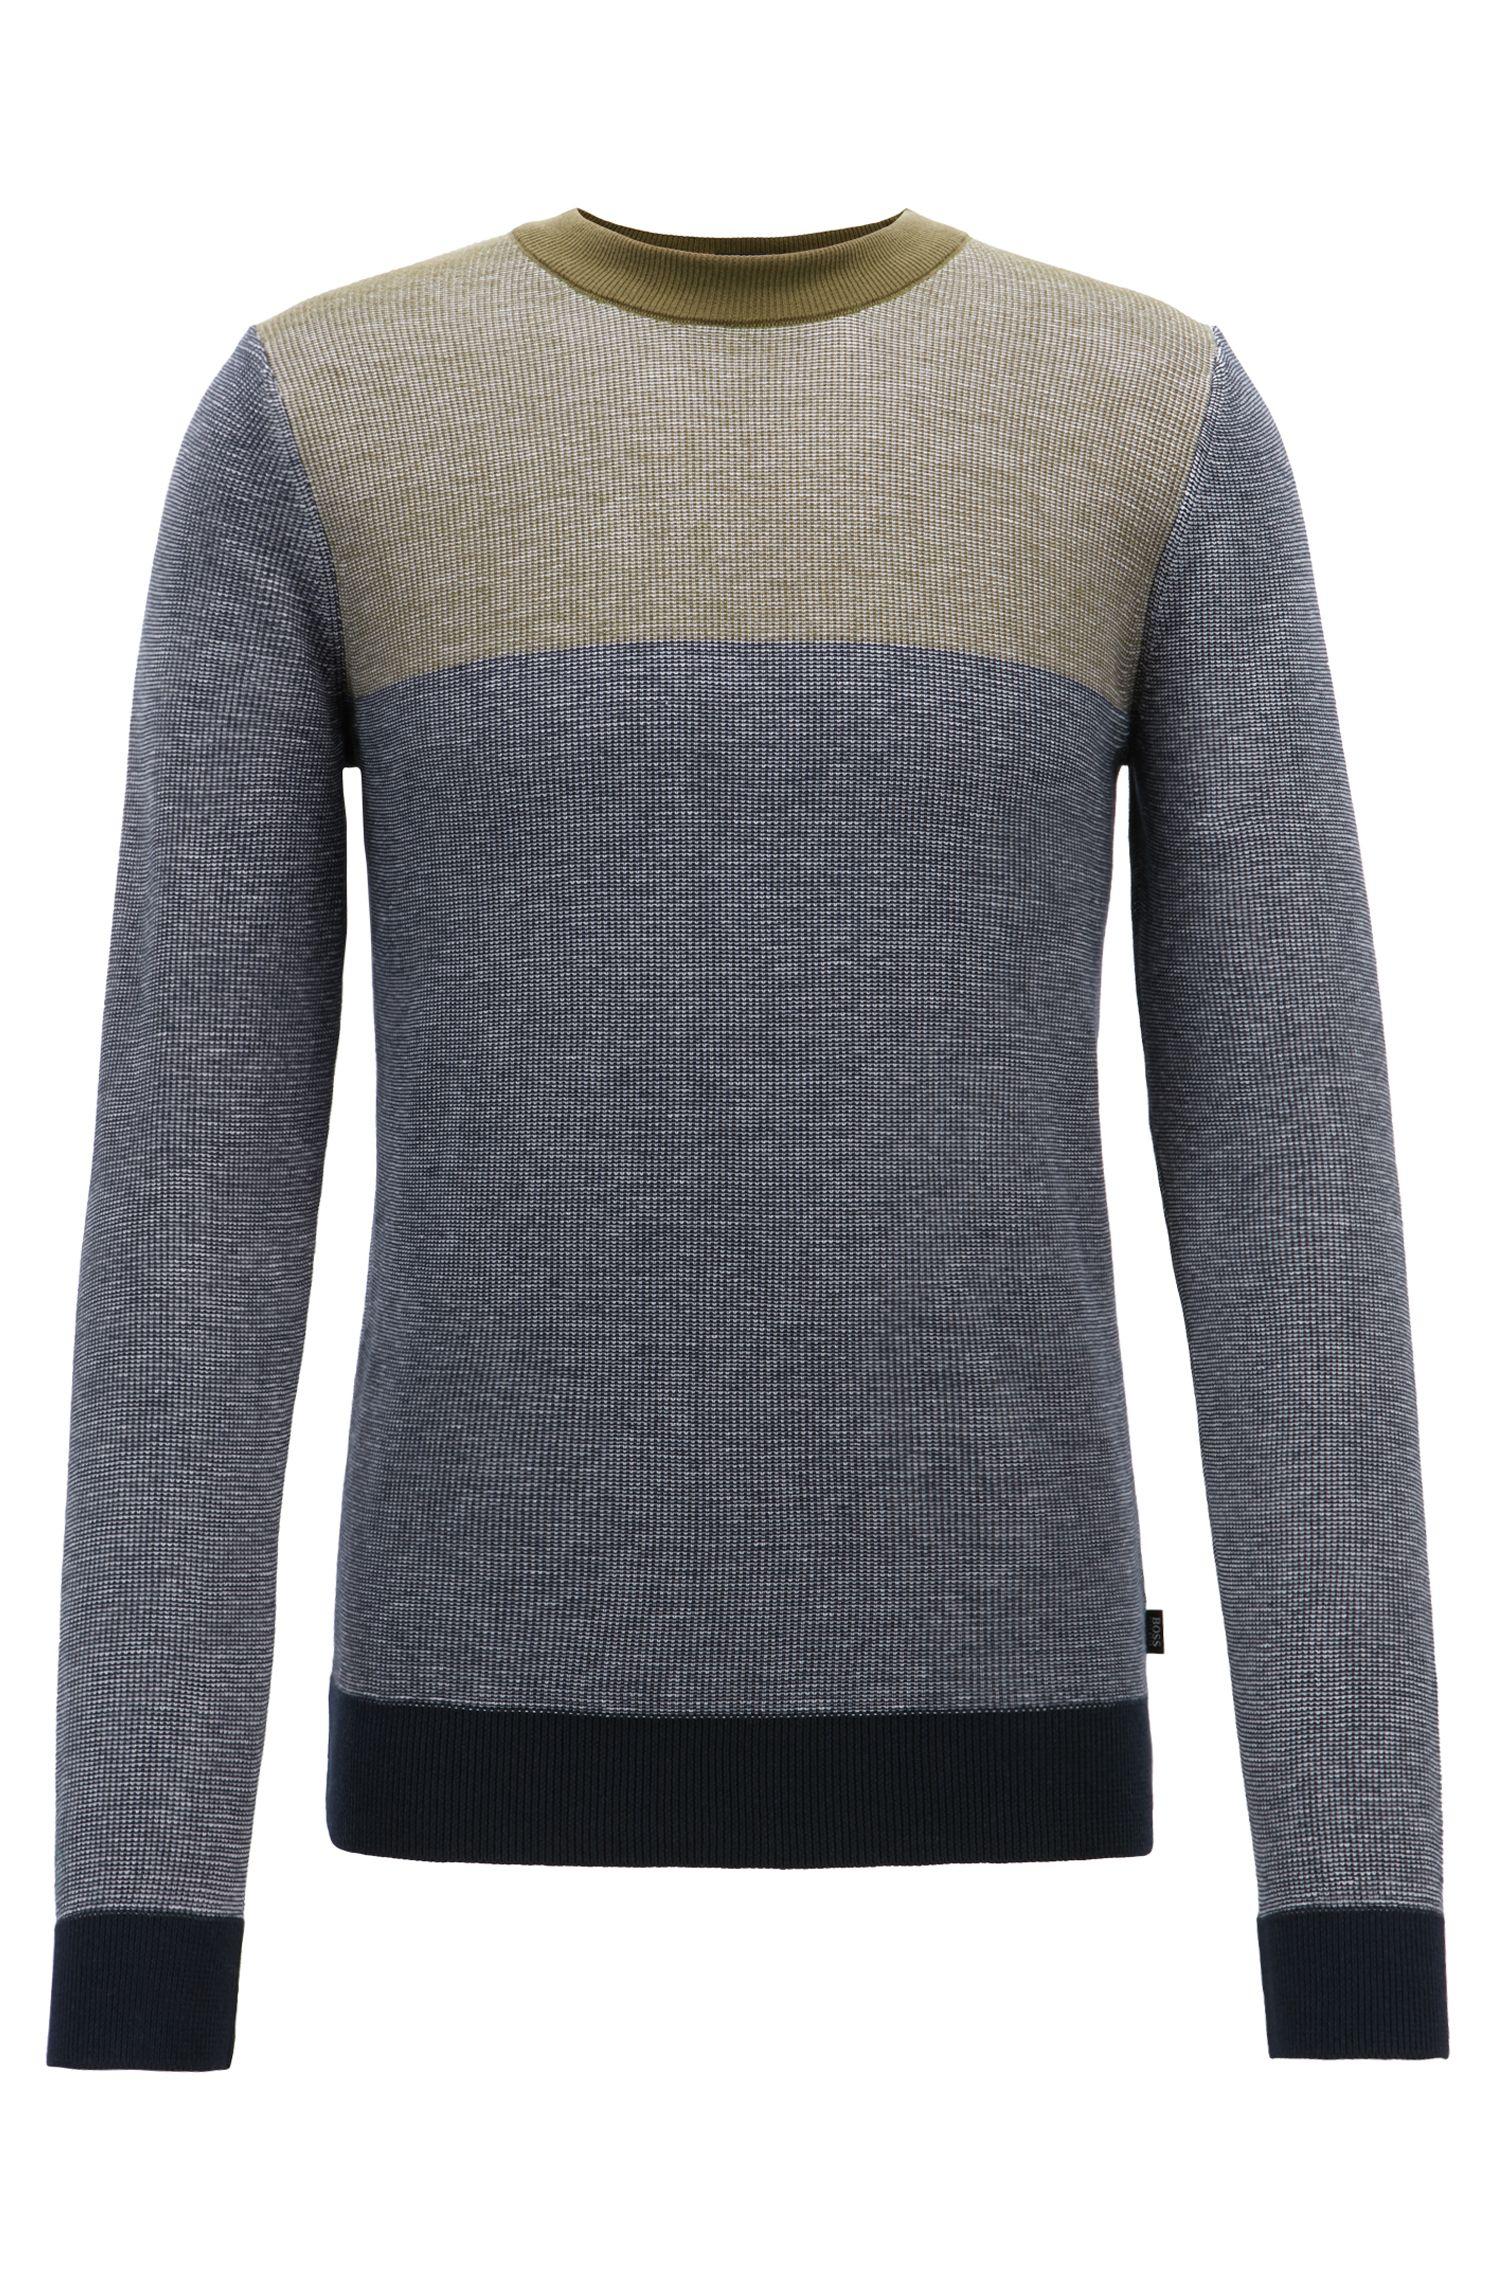 Slim-fit colorblock sweater in melange cotton, Open Blue